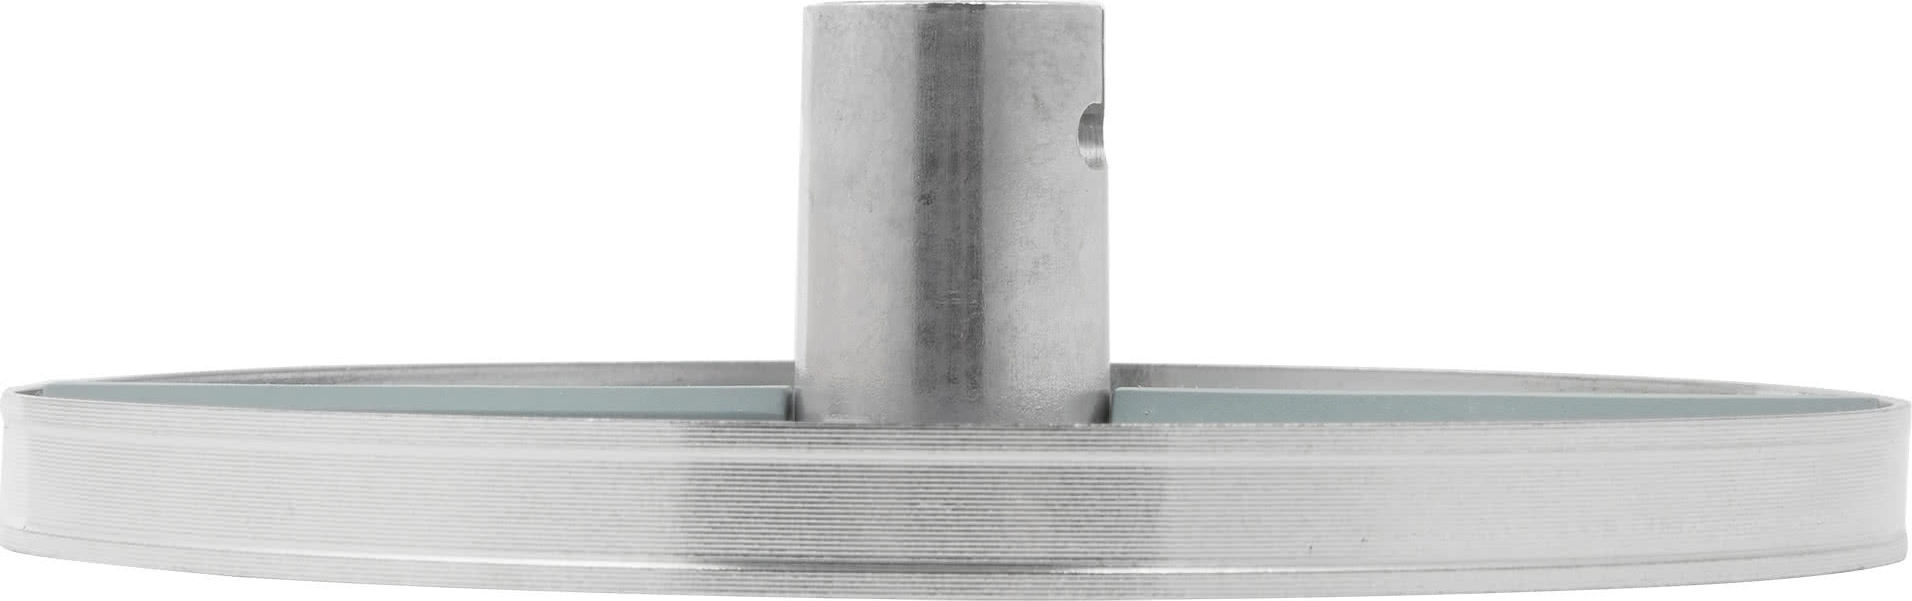 Диск-соломка Robot Coupe 27072(2x4мм) - 3